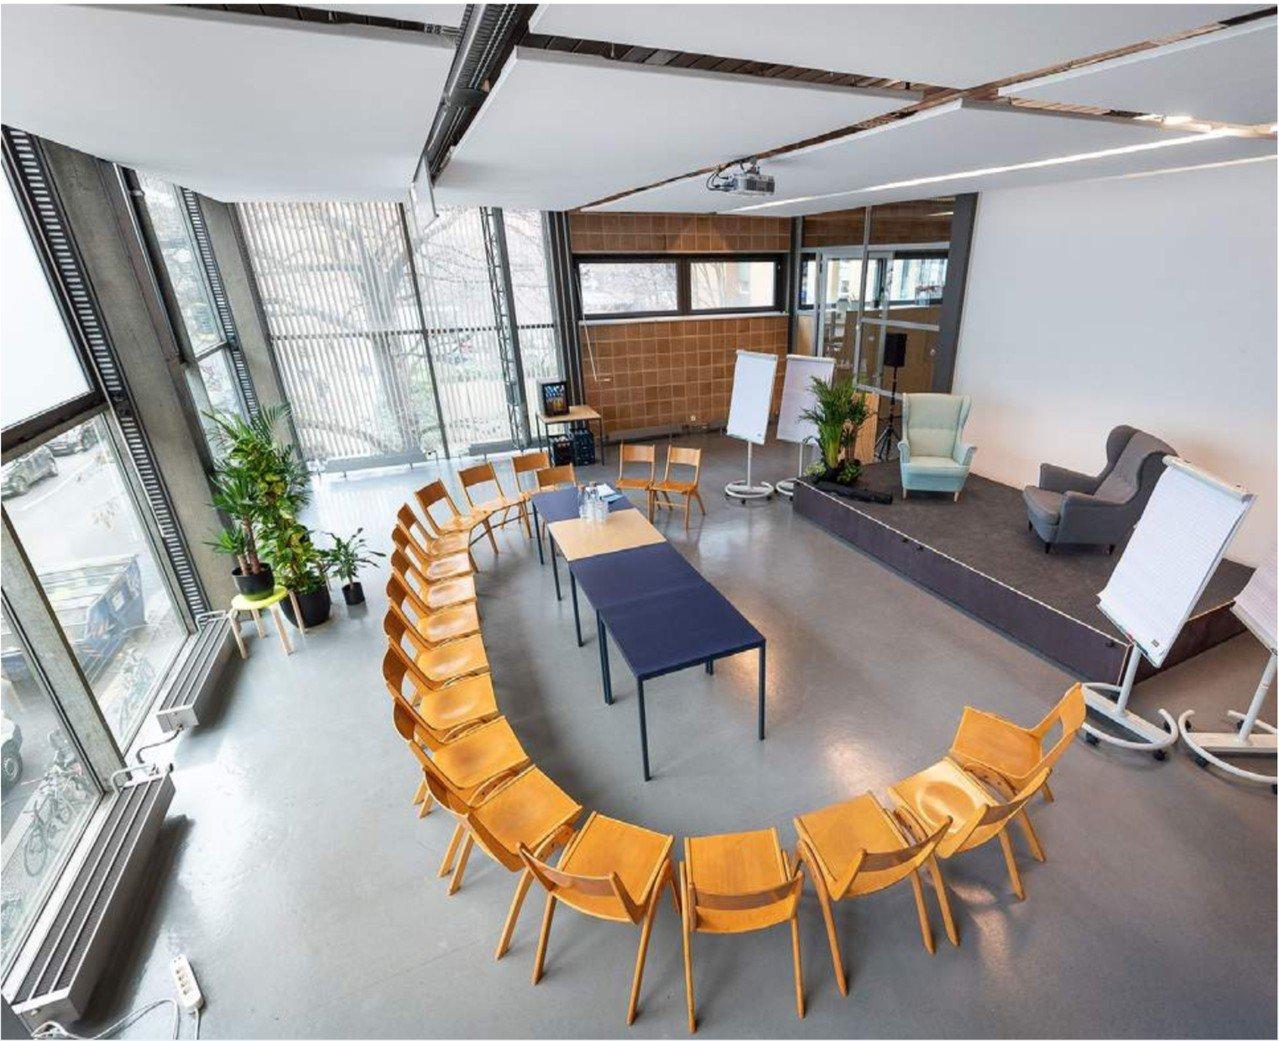 Berlin workshop spaces Espace de Coworking betahaus Kreuzberg - Innospace image 0